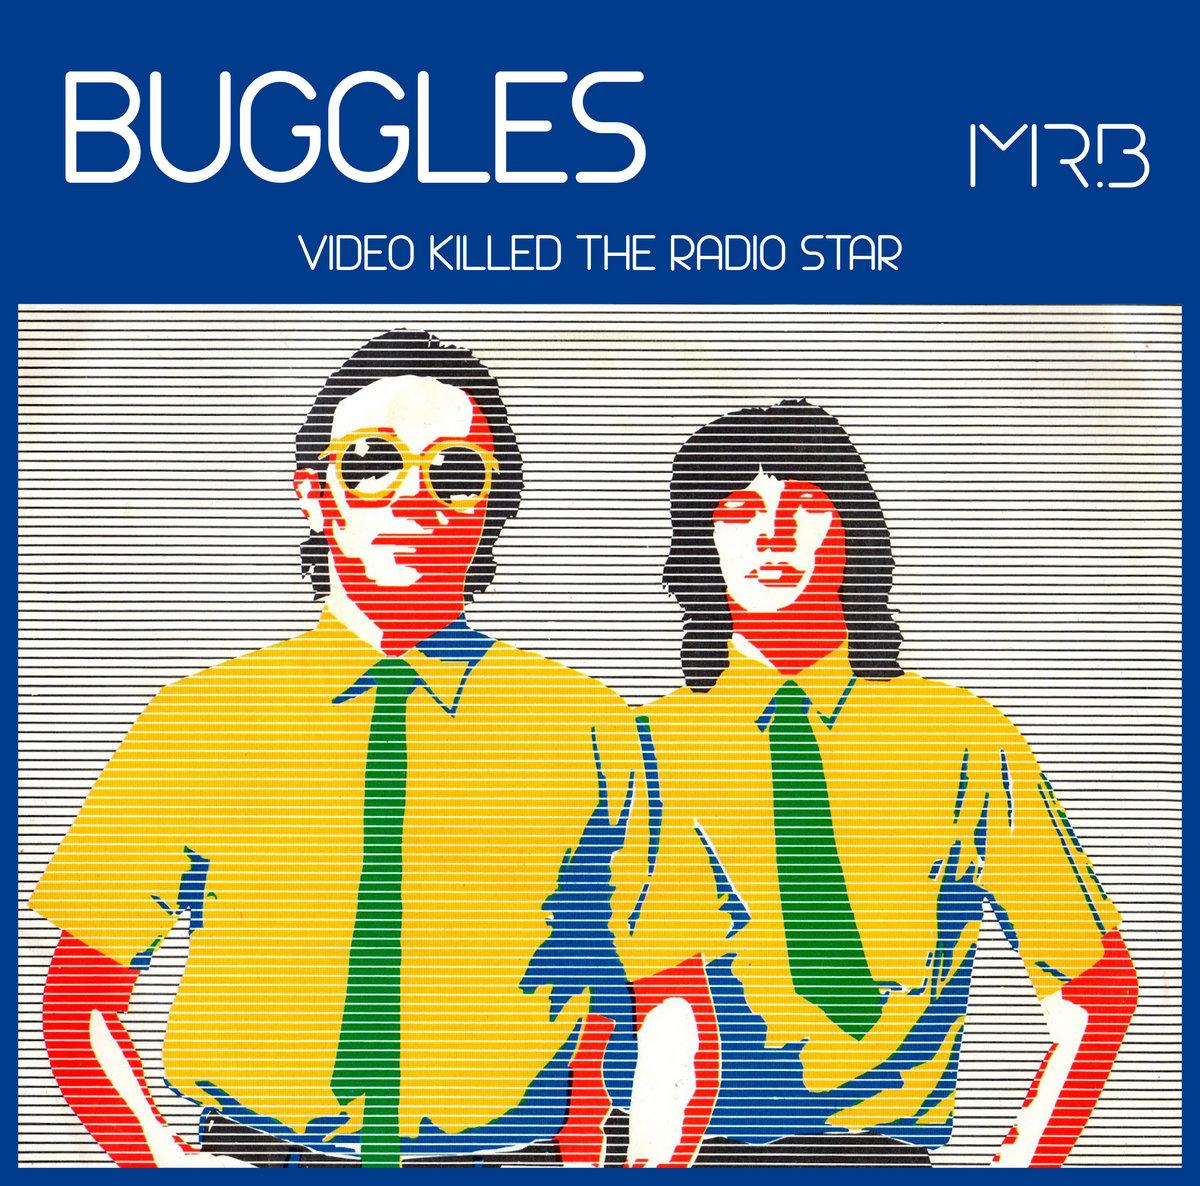 mp3 buggles